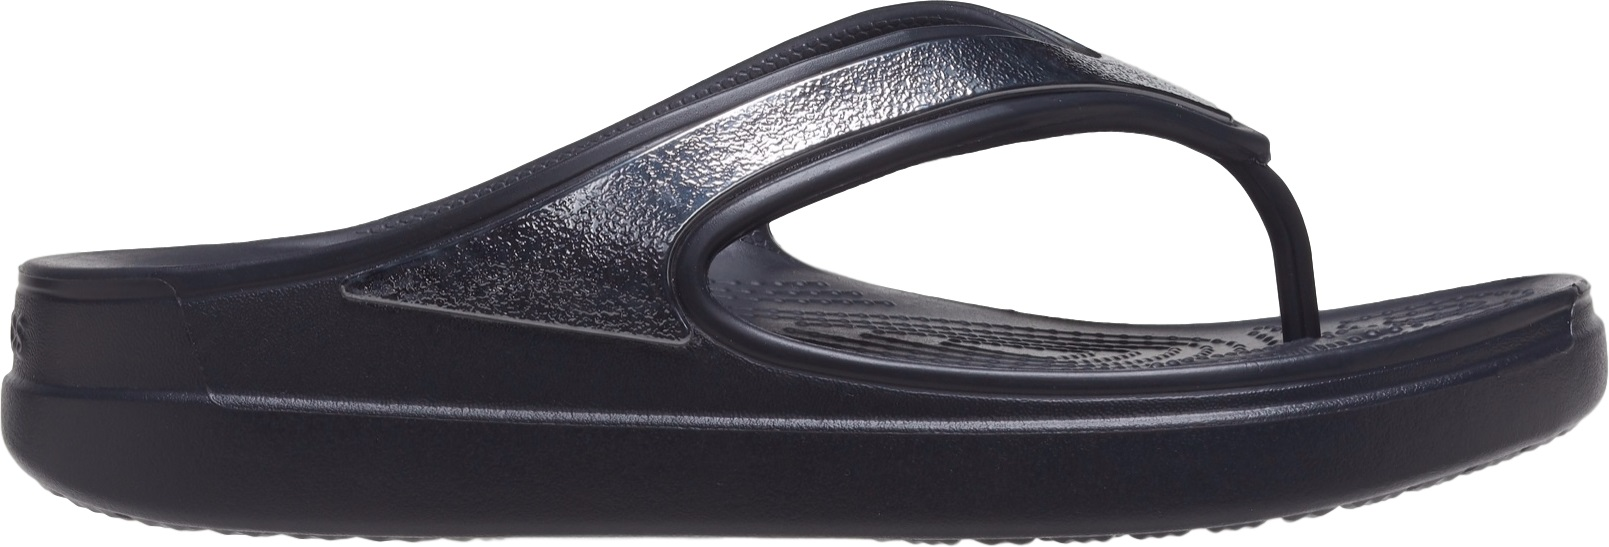 Crocs™ Sloane Shine Wedge Flip Black 42,5